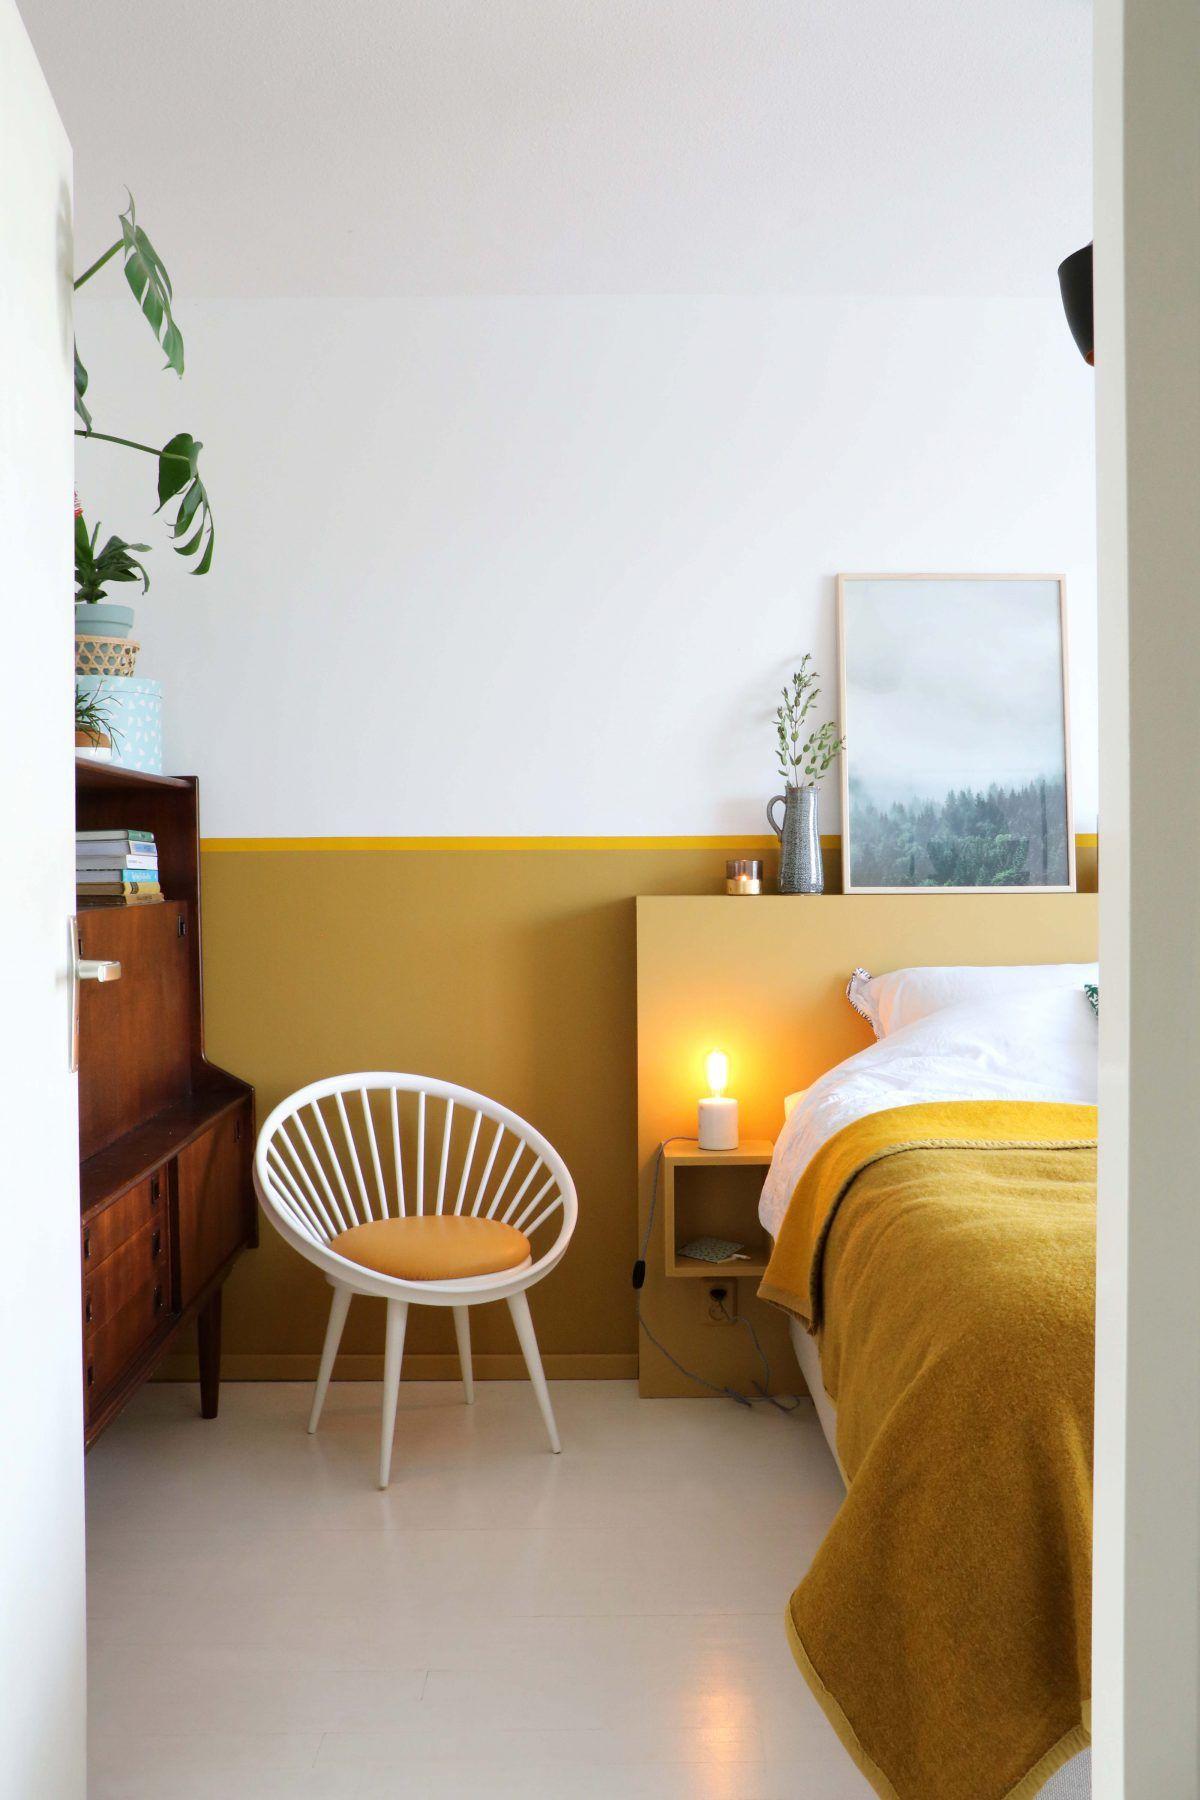 My attic voor karwei diy headboard bedroom slaapkamer ochre oker photography marij - Deco slaapkamer tiener meisje ...